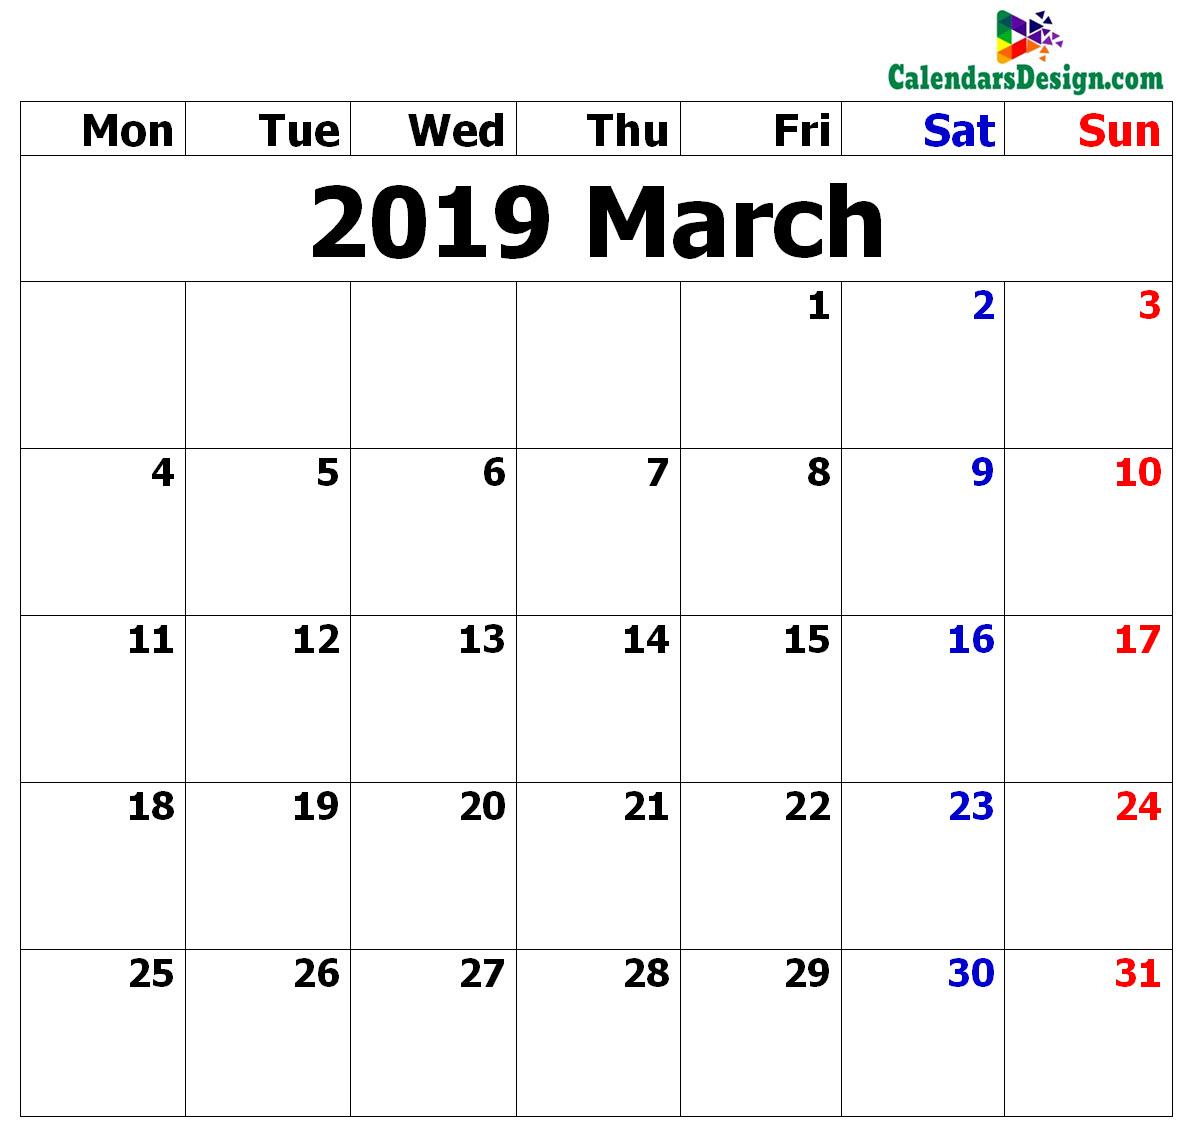 March Calendar 2019 in Excel Format